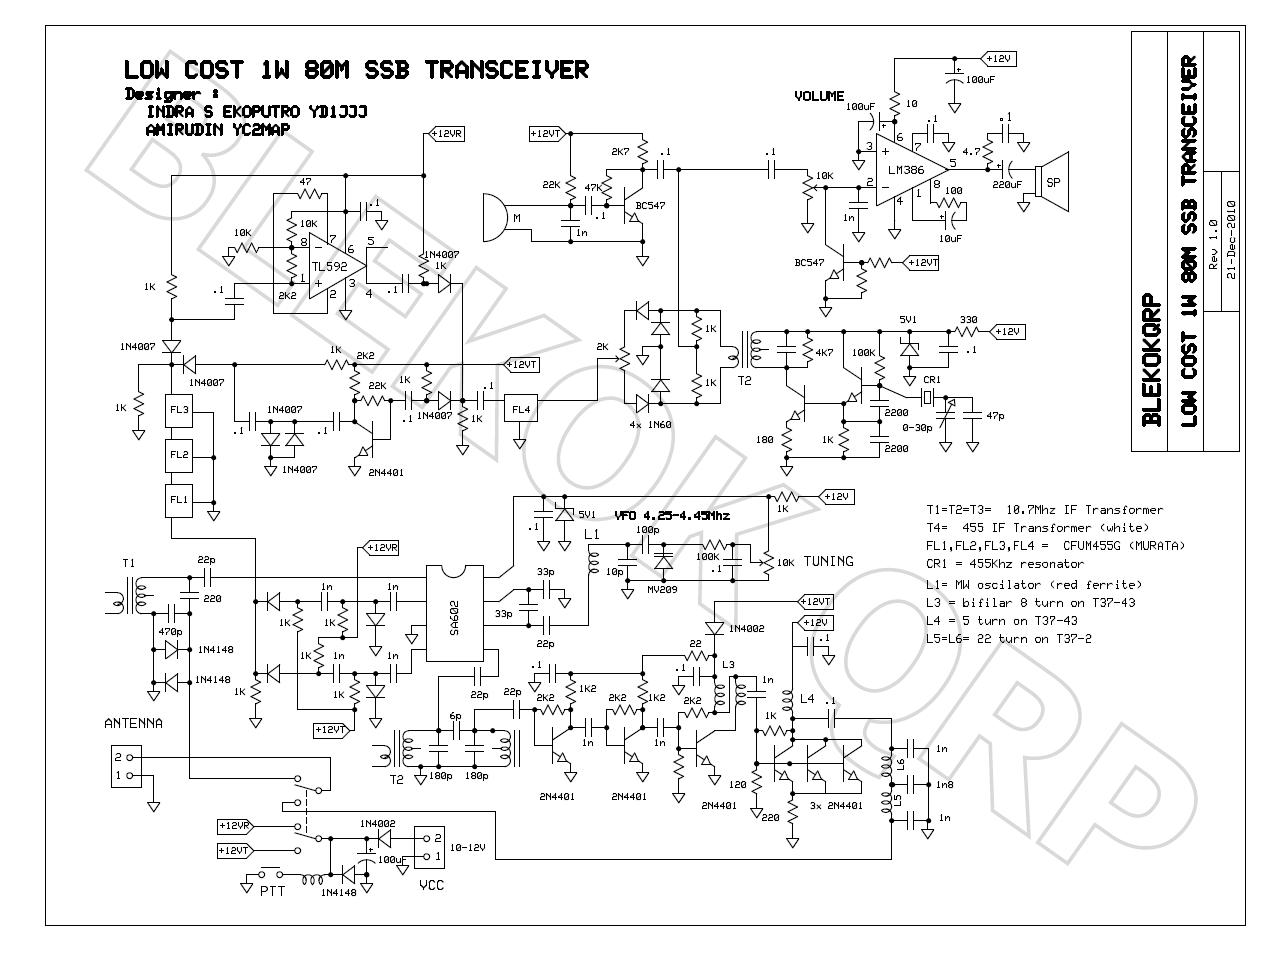 Blekok Qrp By Yd1jjj Simple 1w 80m Ssb Transceiver Prototype